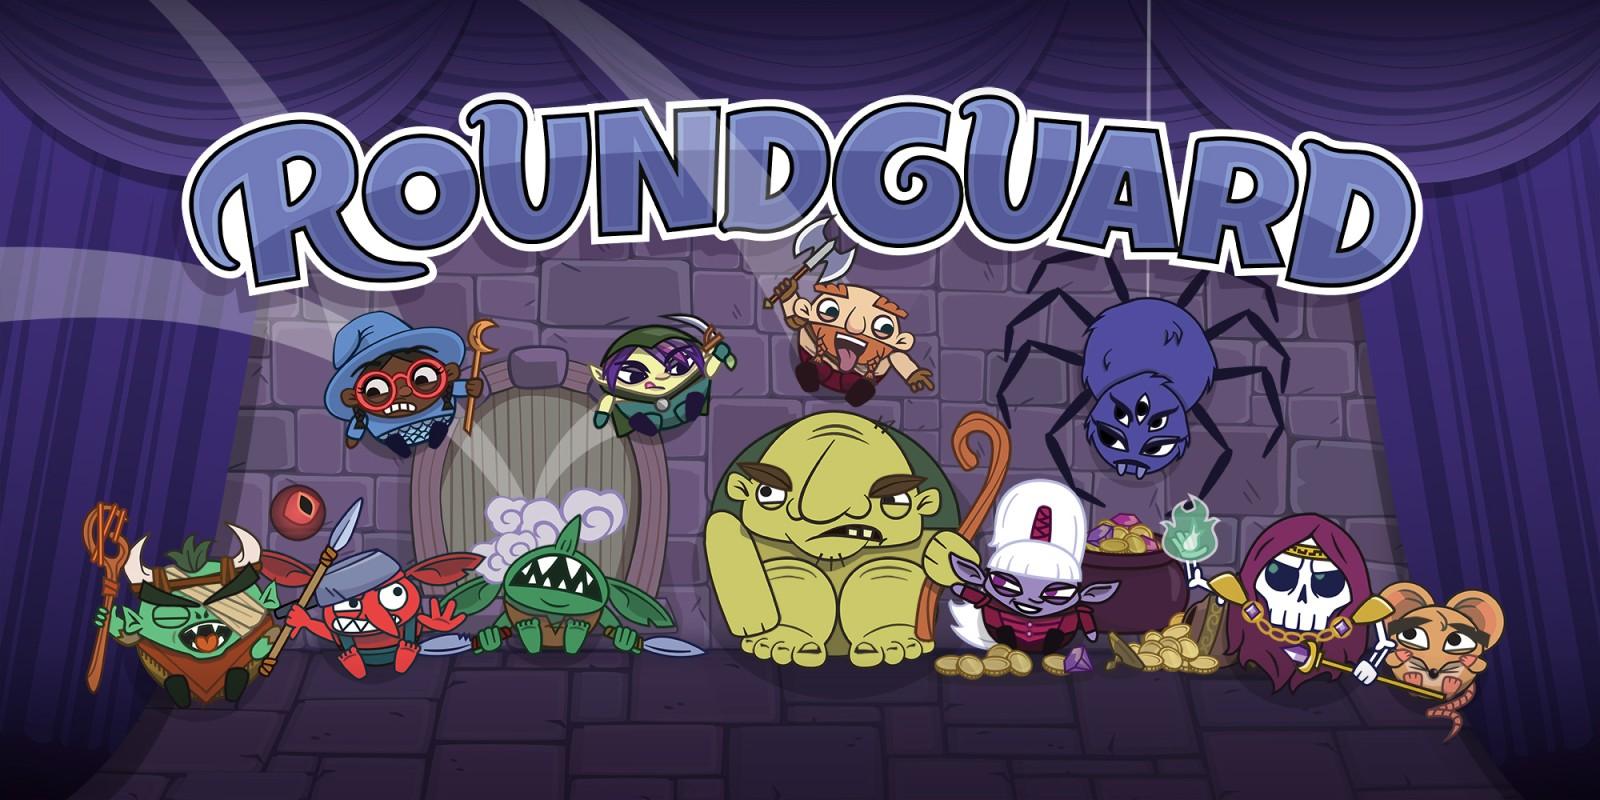 H2x1_NSwitchDS_Roundguard_image1600w.jpg